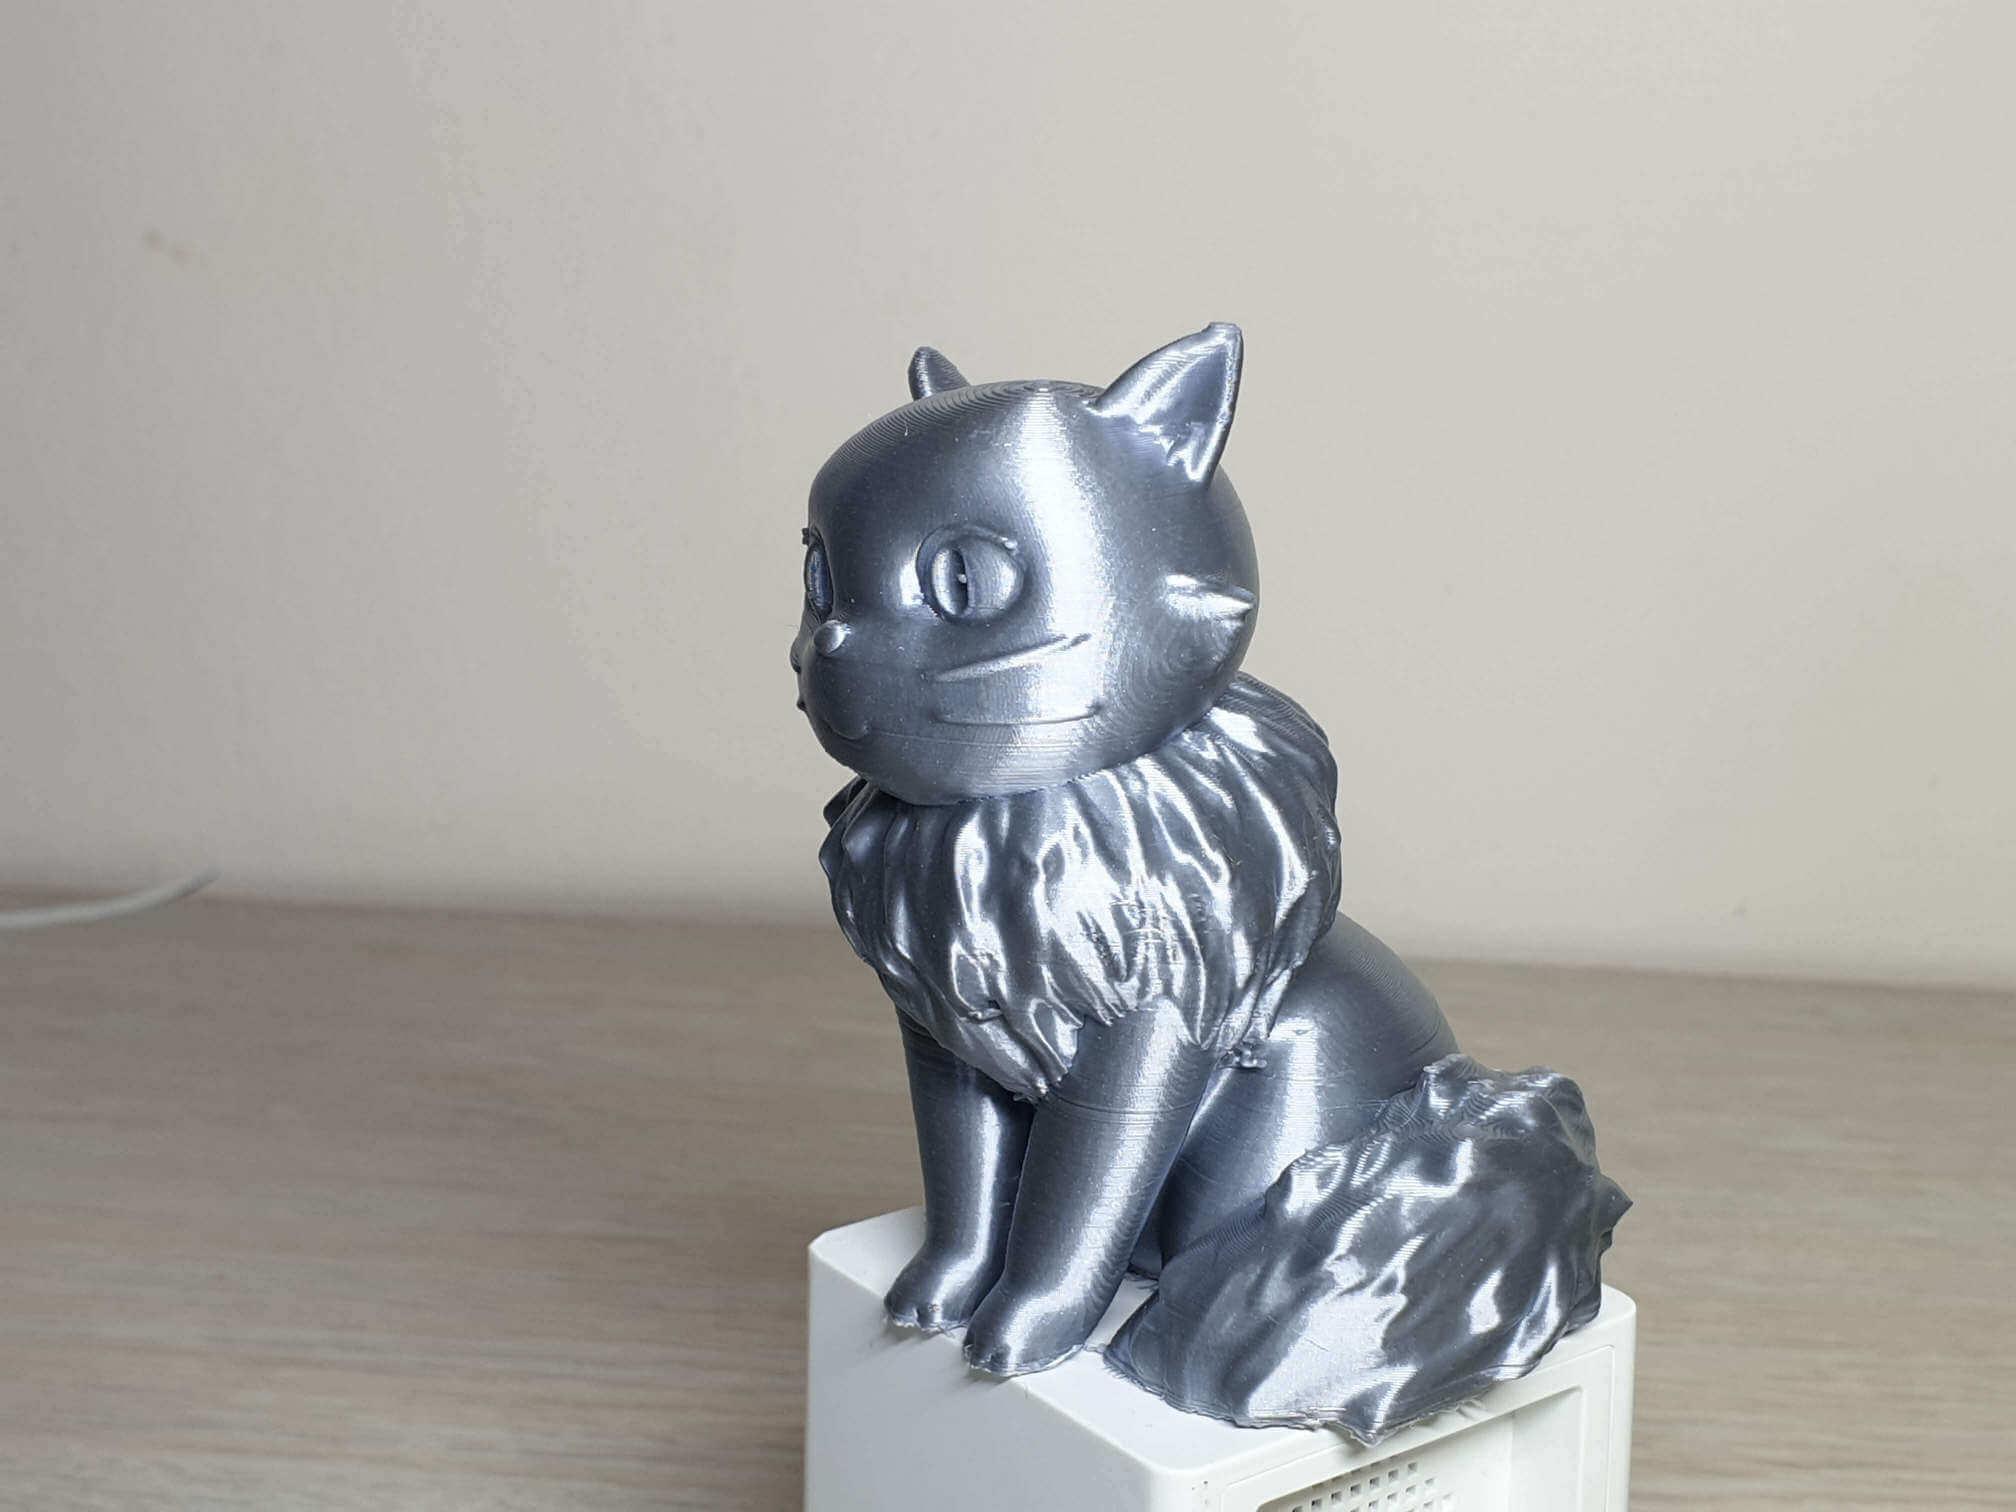 Lily printed on Longer Cube2 Mini 5 | Cube2 Mini Review - 3D Printer for Kids